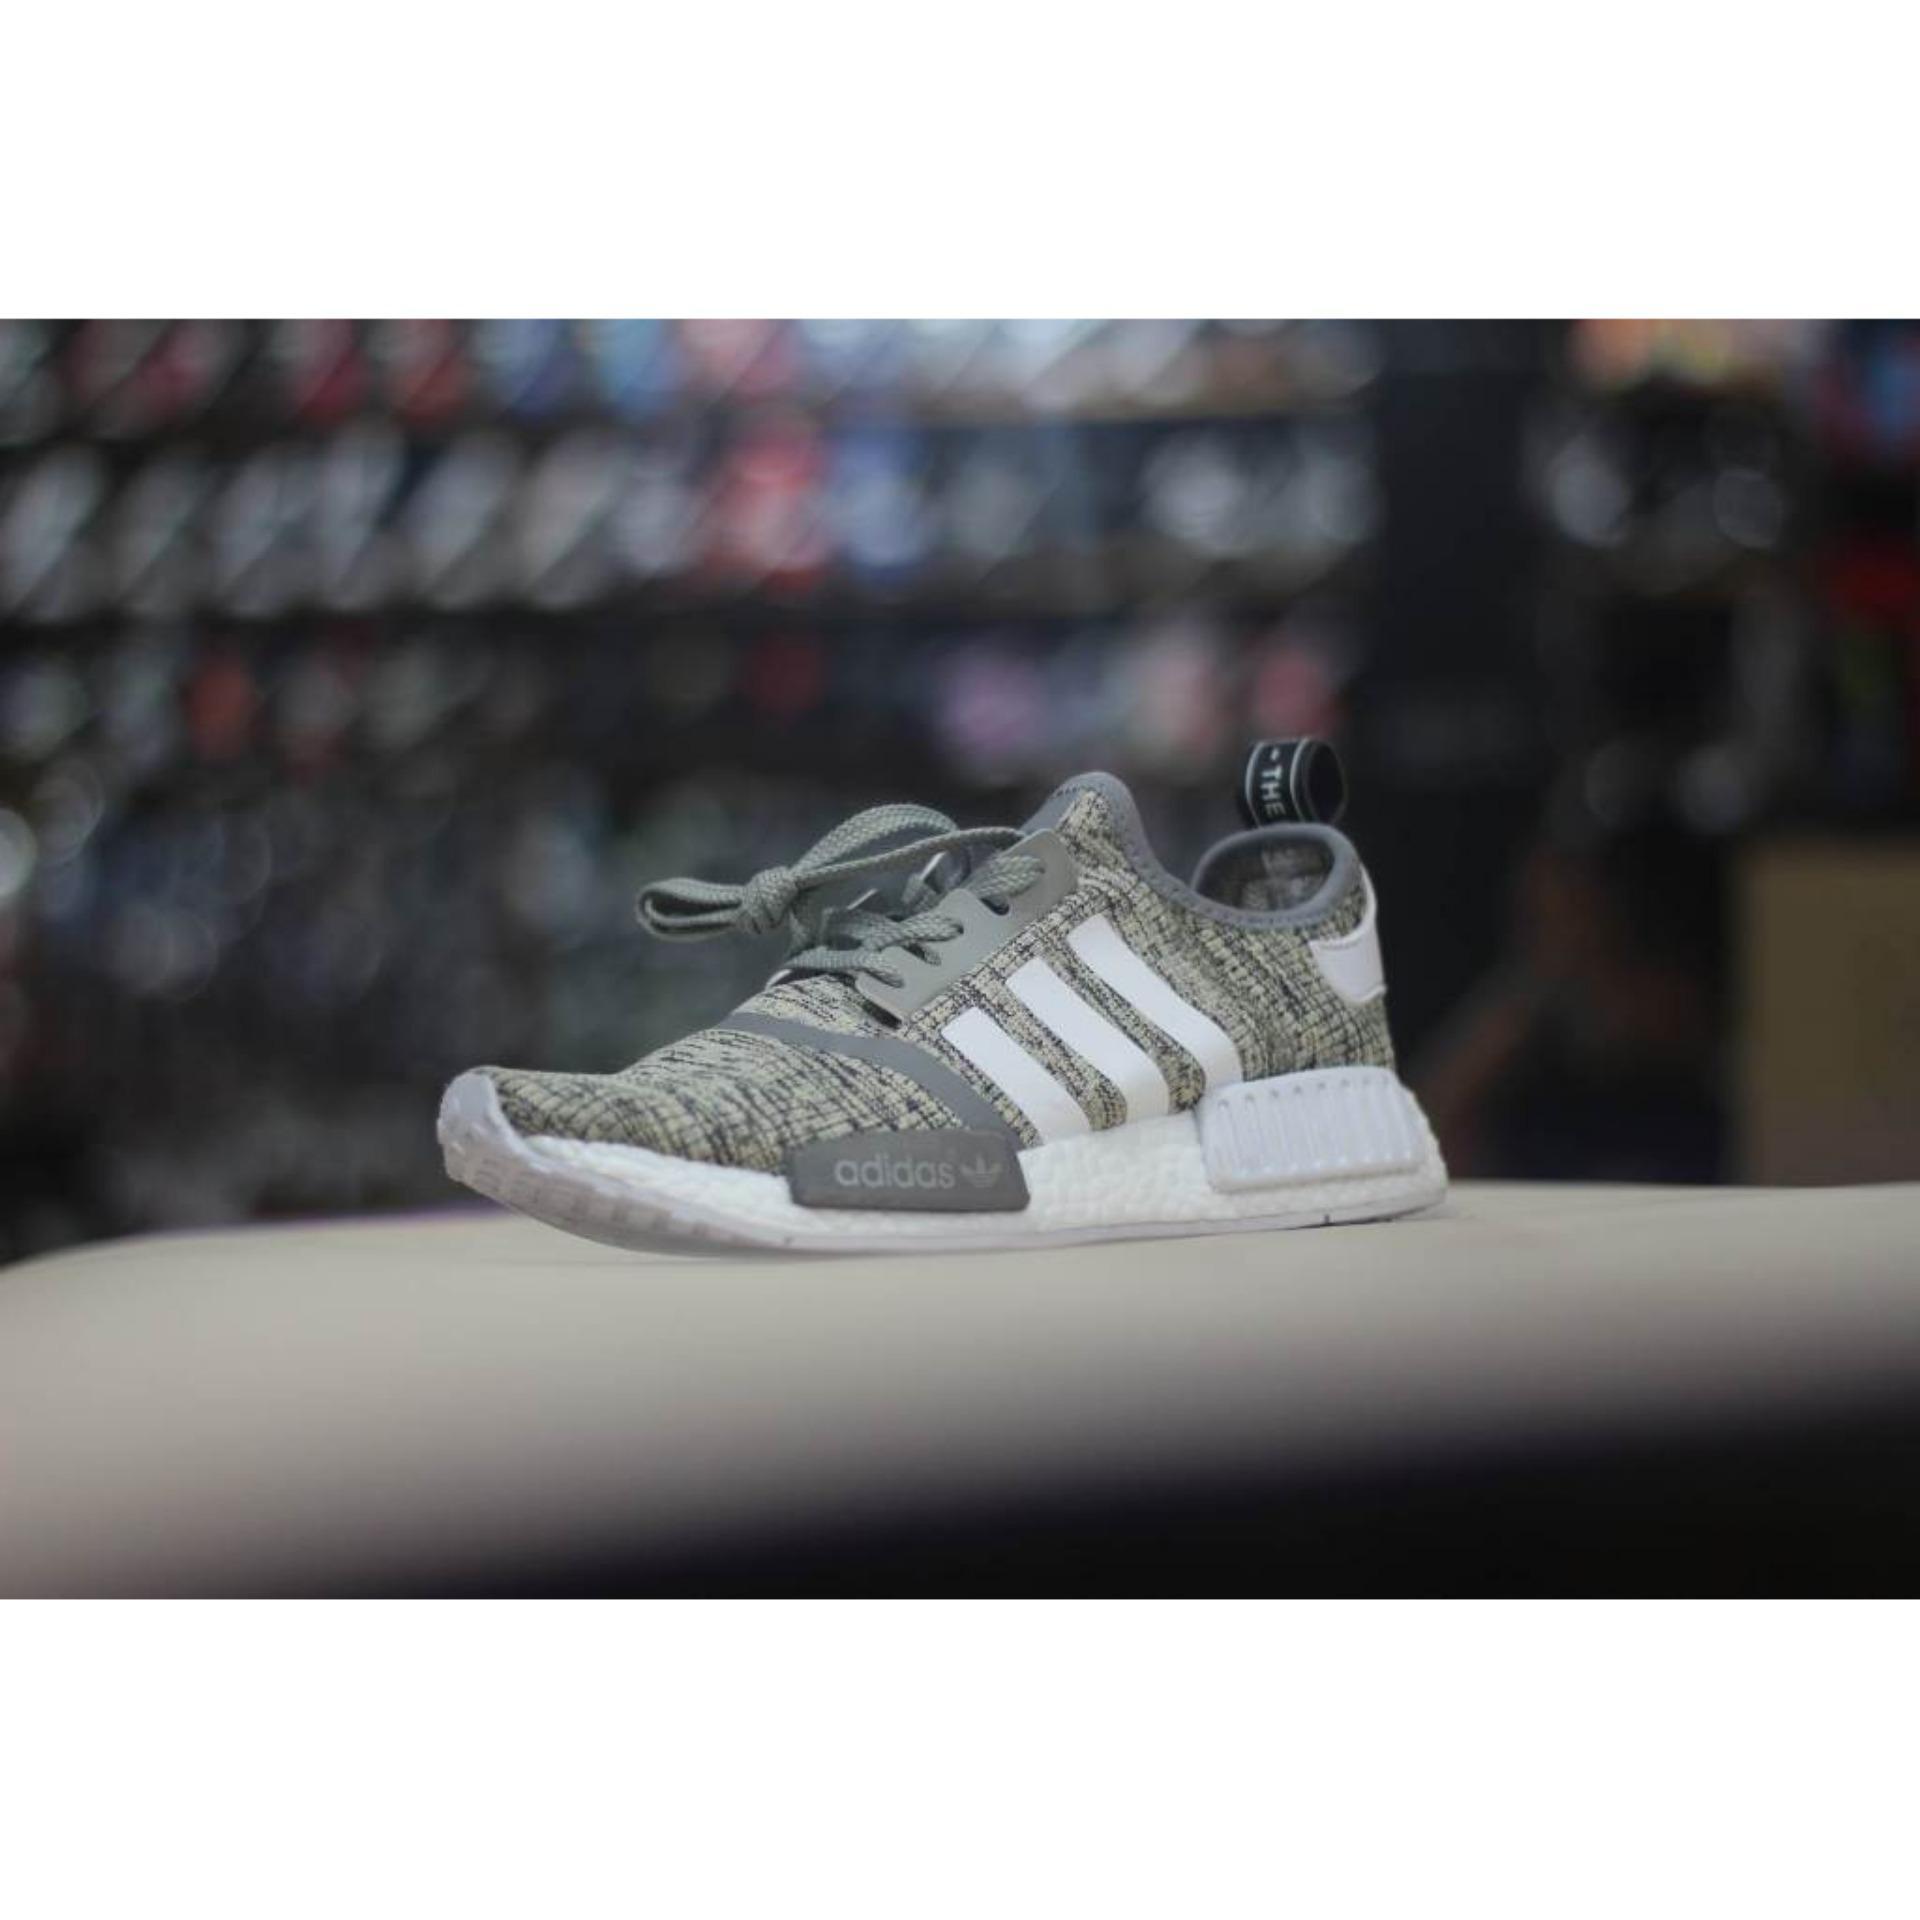 Sepatu Adidas NMD Tokyo Premium 0400 16